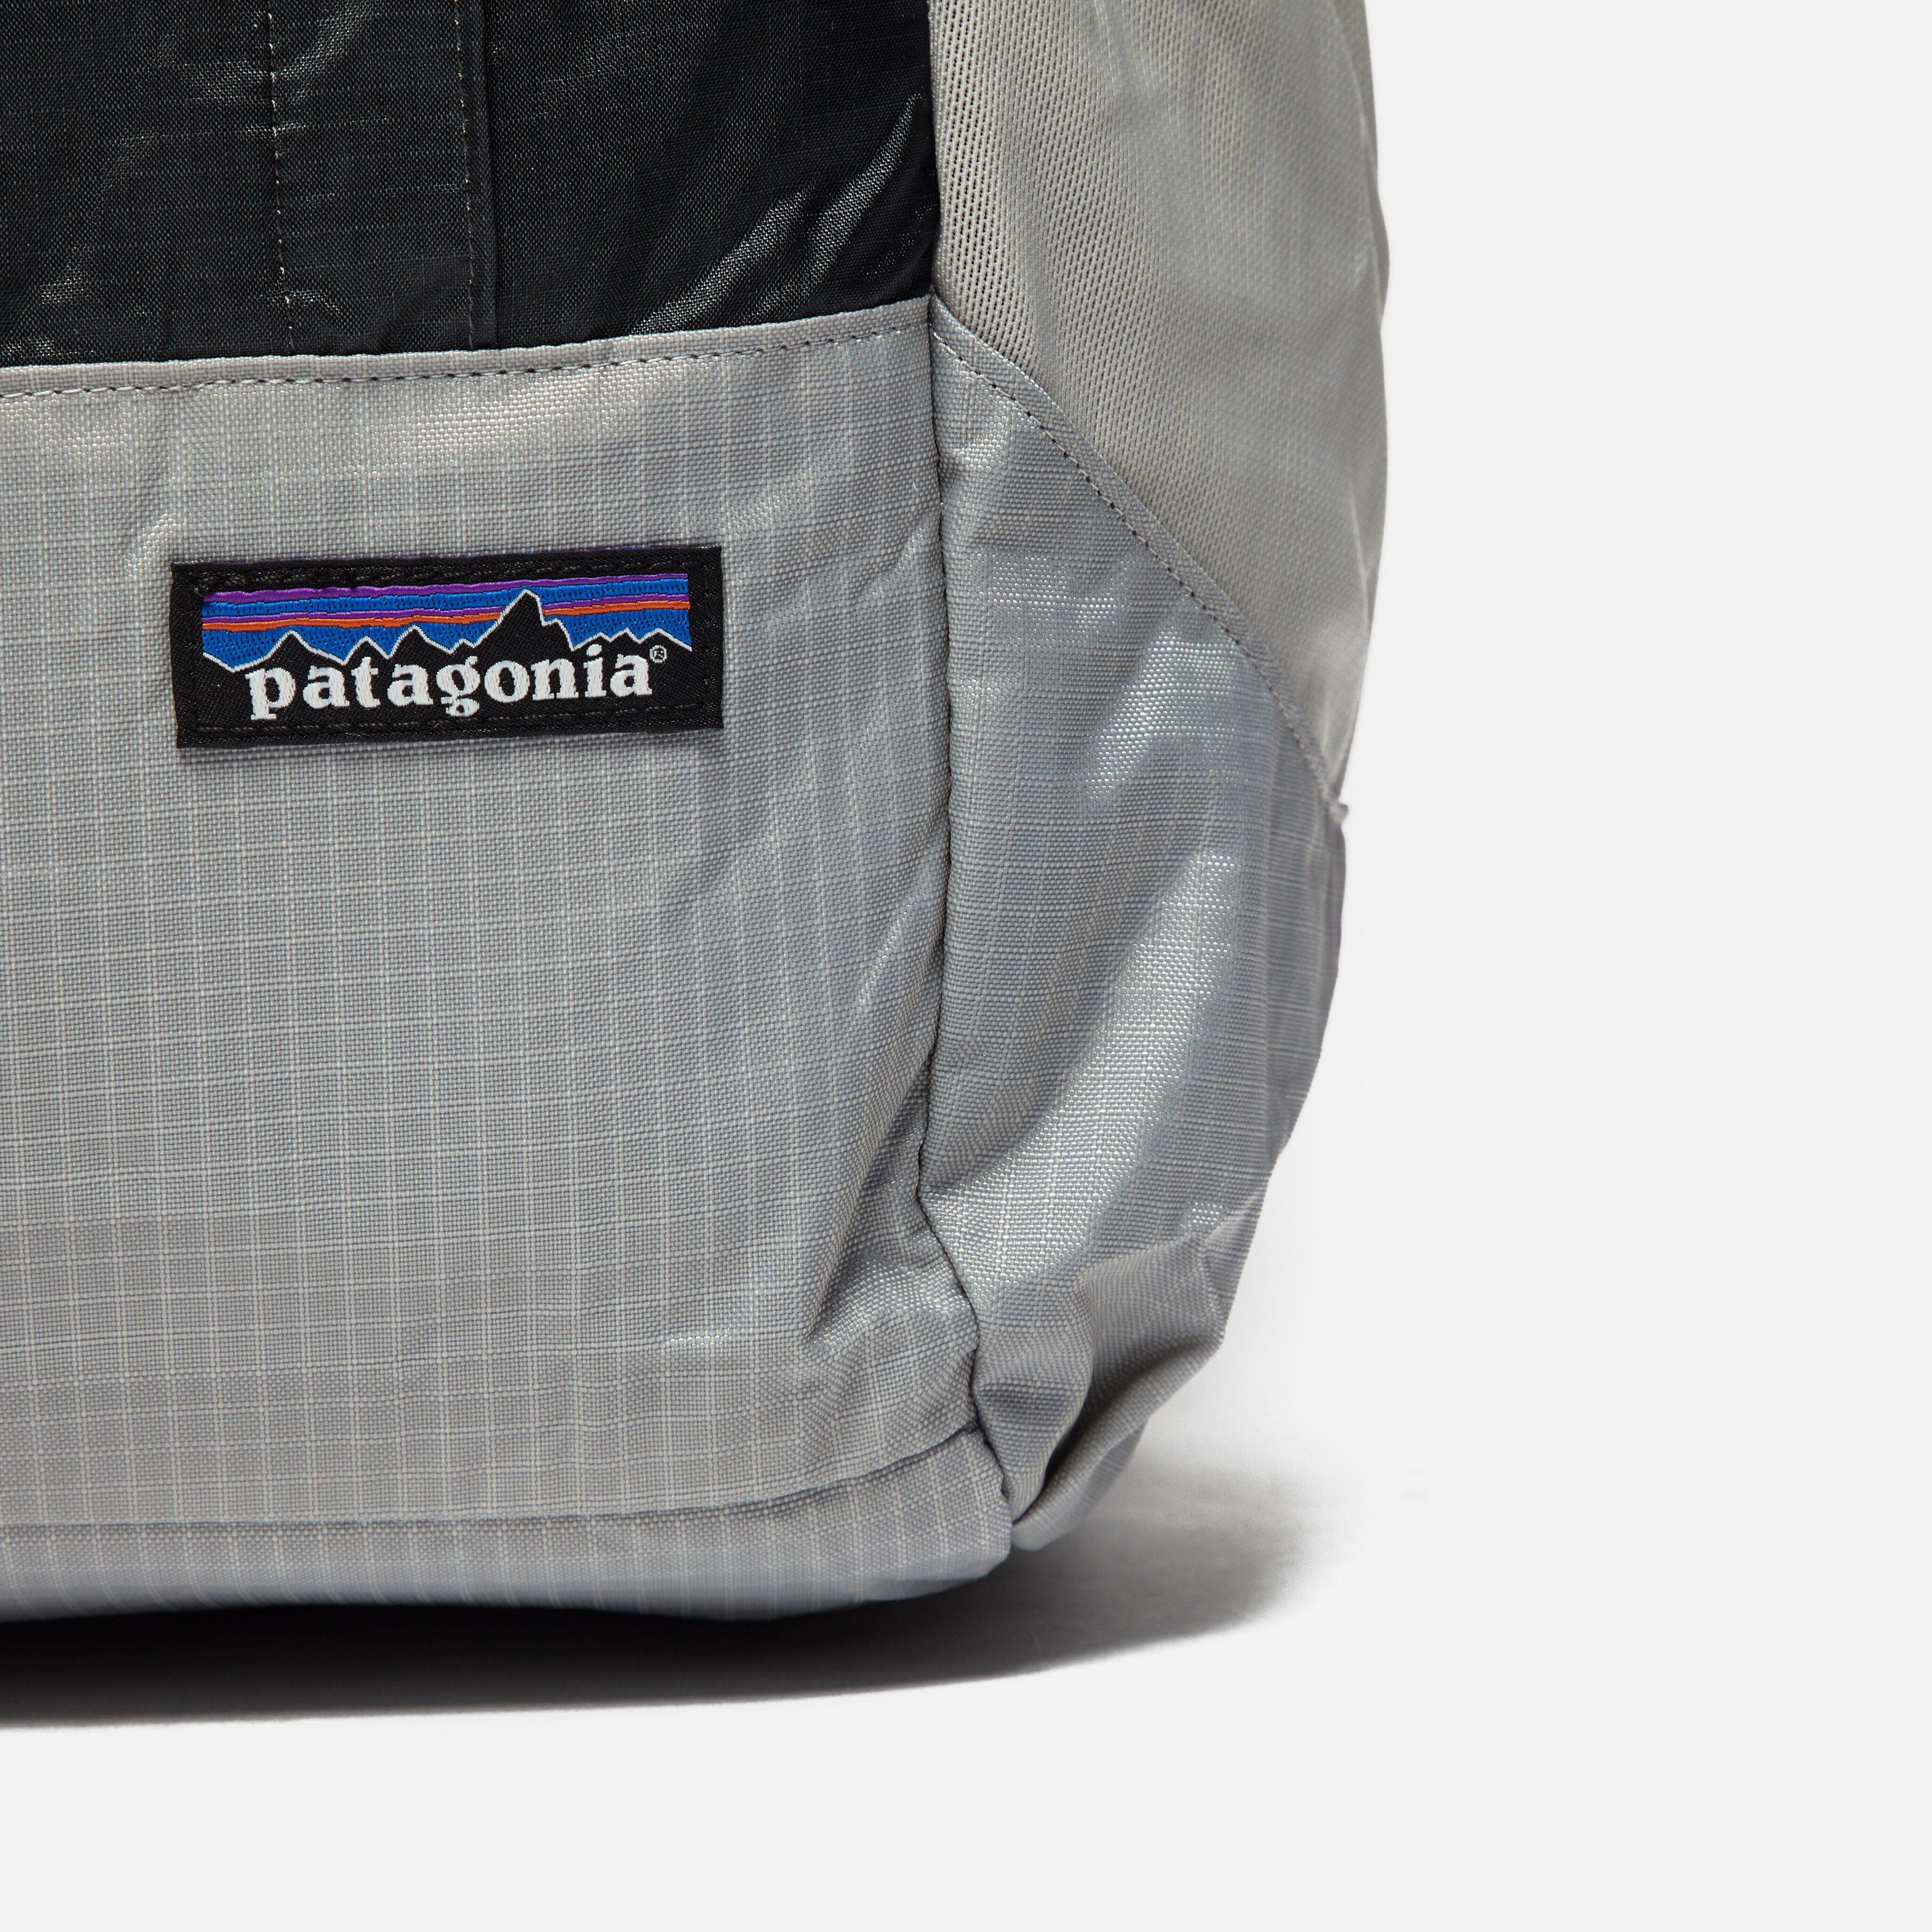 Patagonia LW Travel Tote Pack